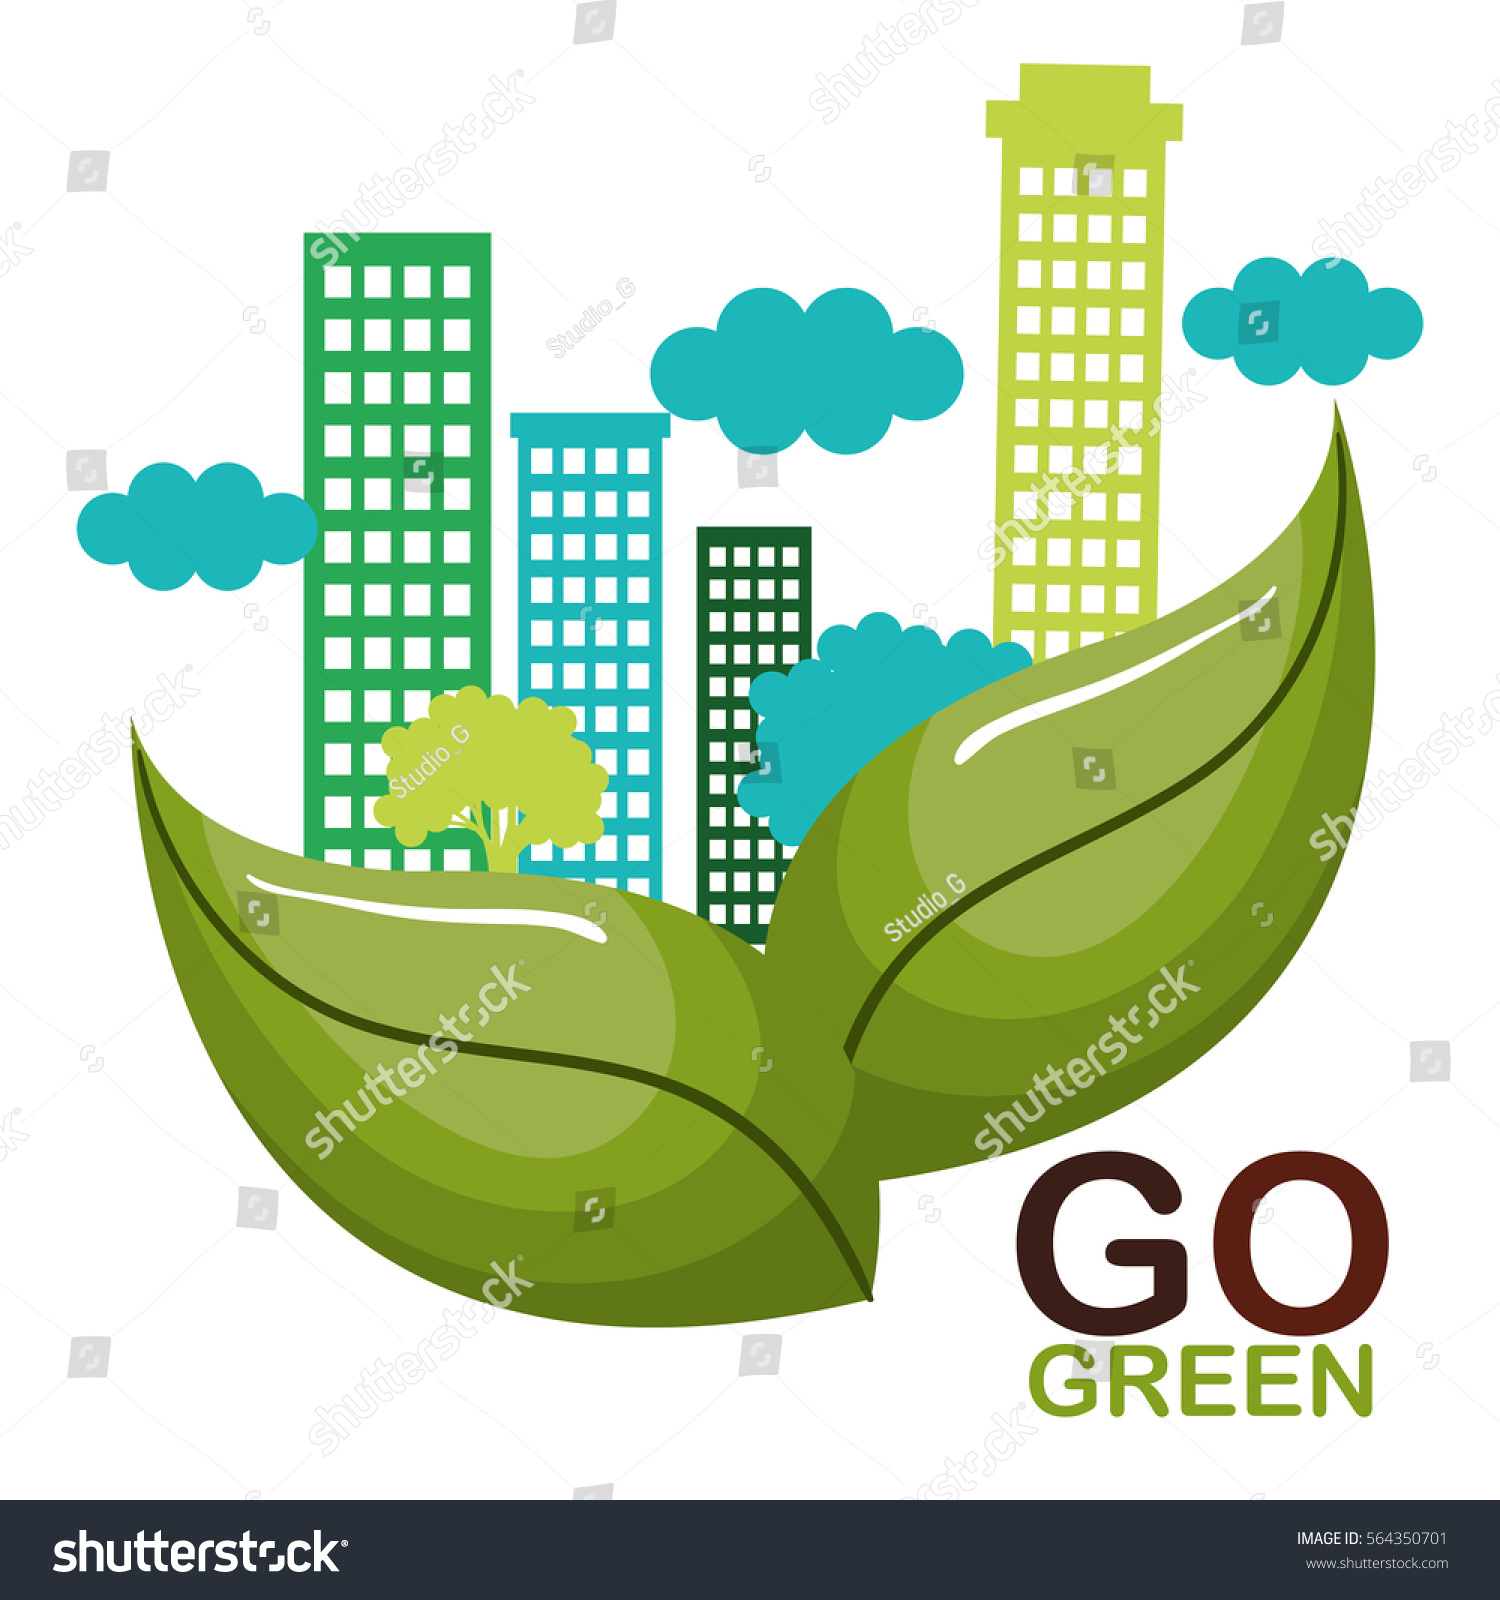 Contoh Gambar Poster Go Green - AR Production